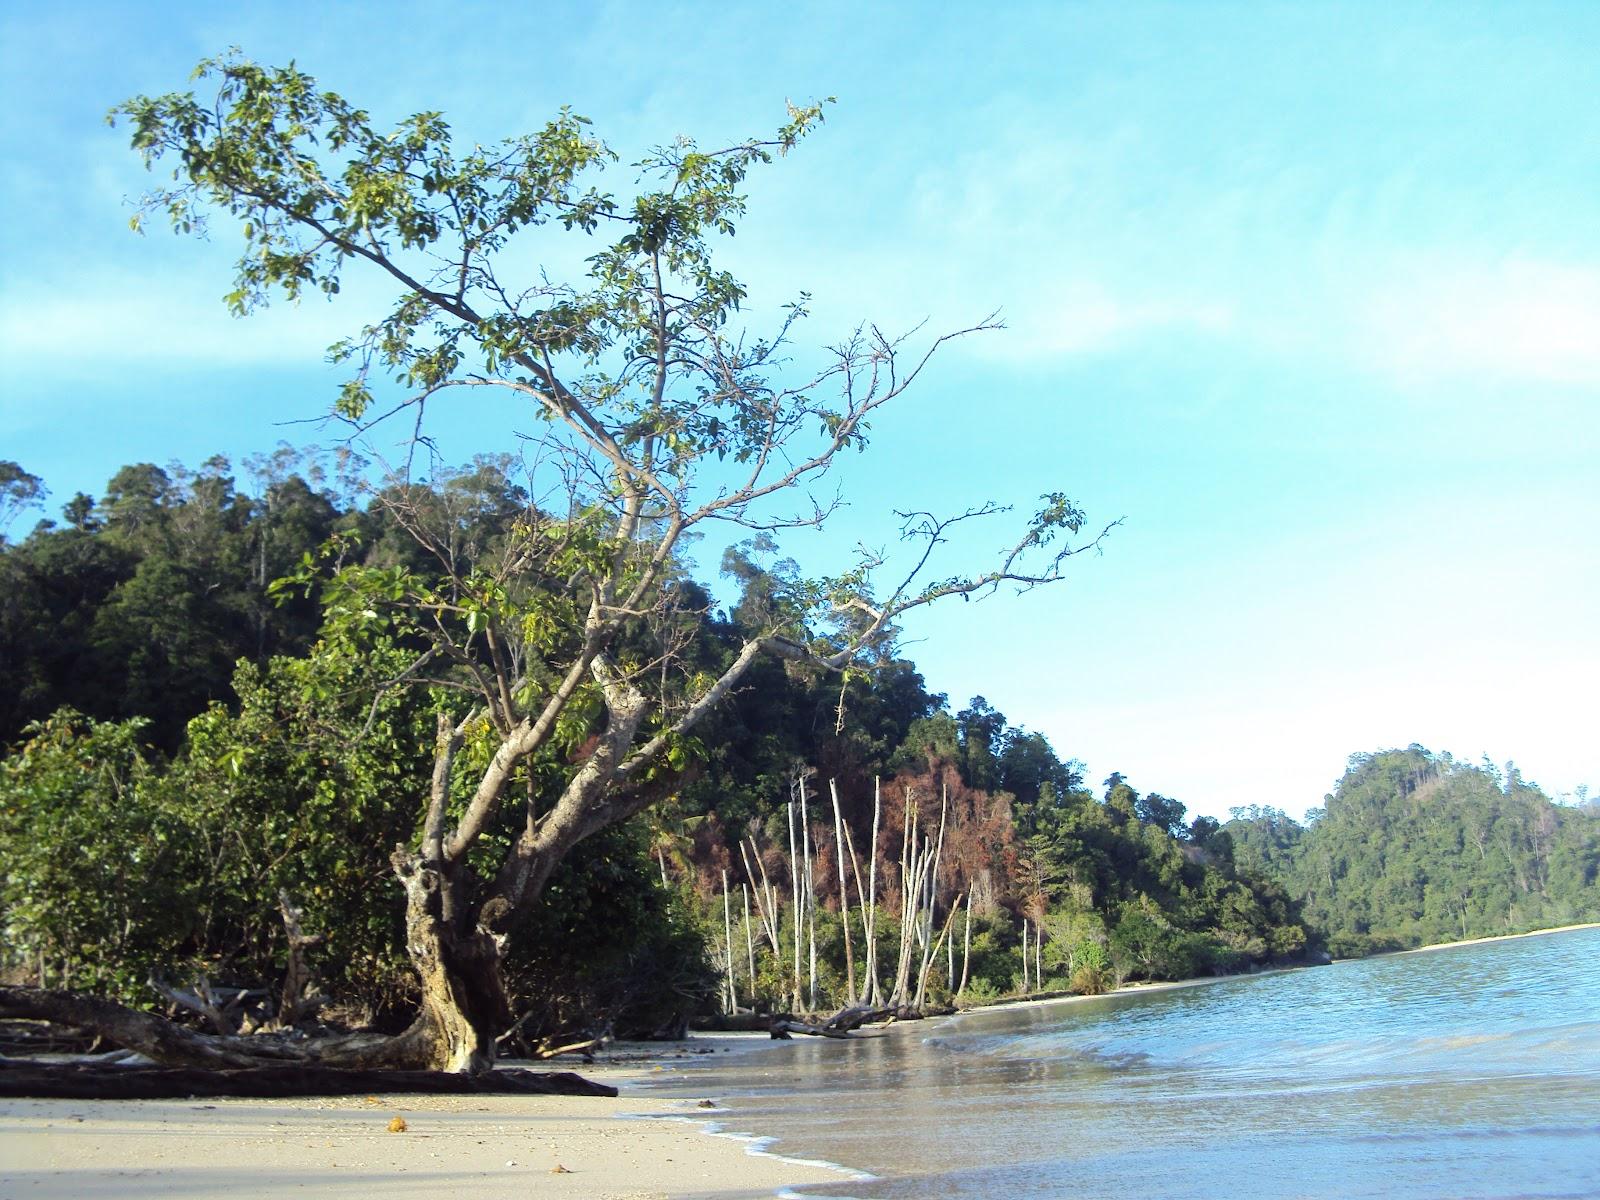 pantai jerong di kabupaten pesisir selatan,kec IV jurai yang masih